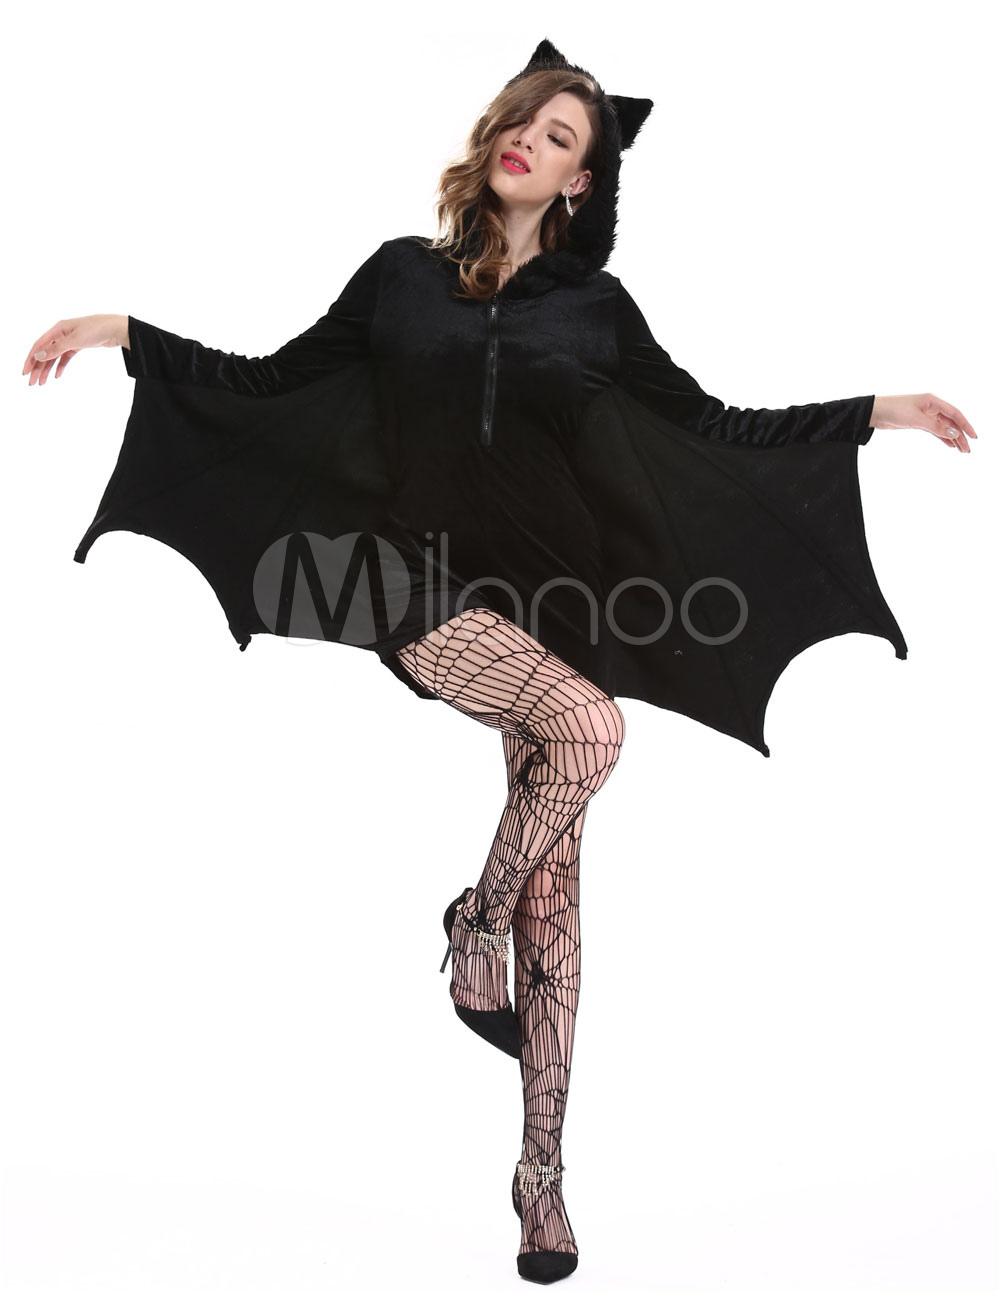 Magical student fantasy costume